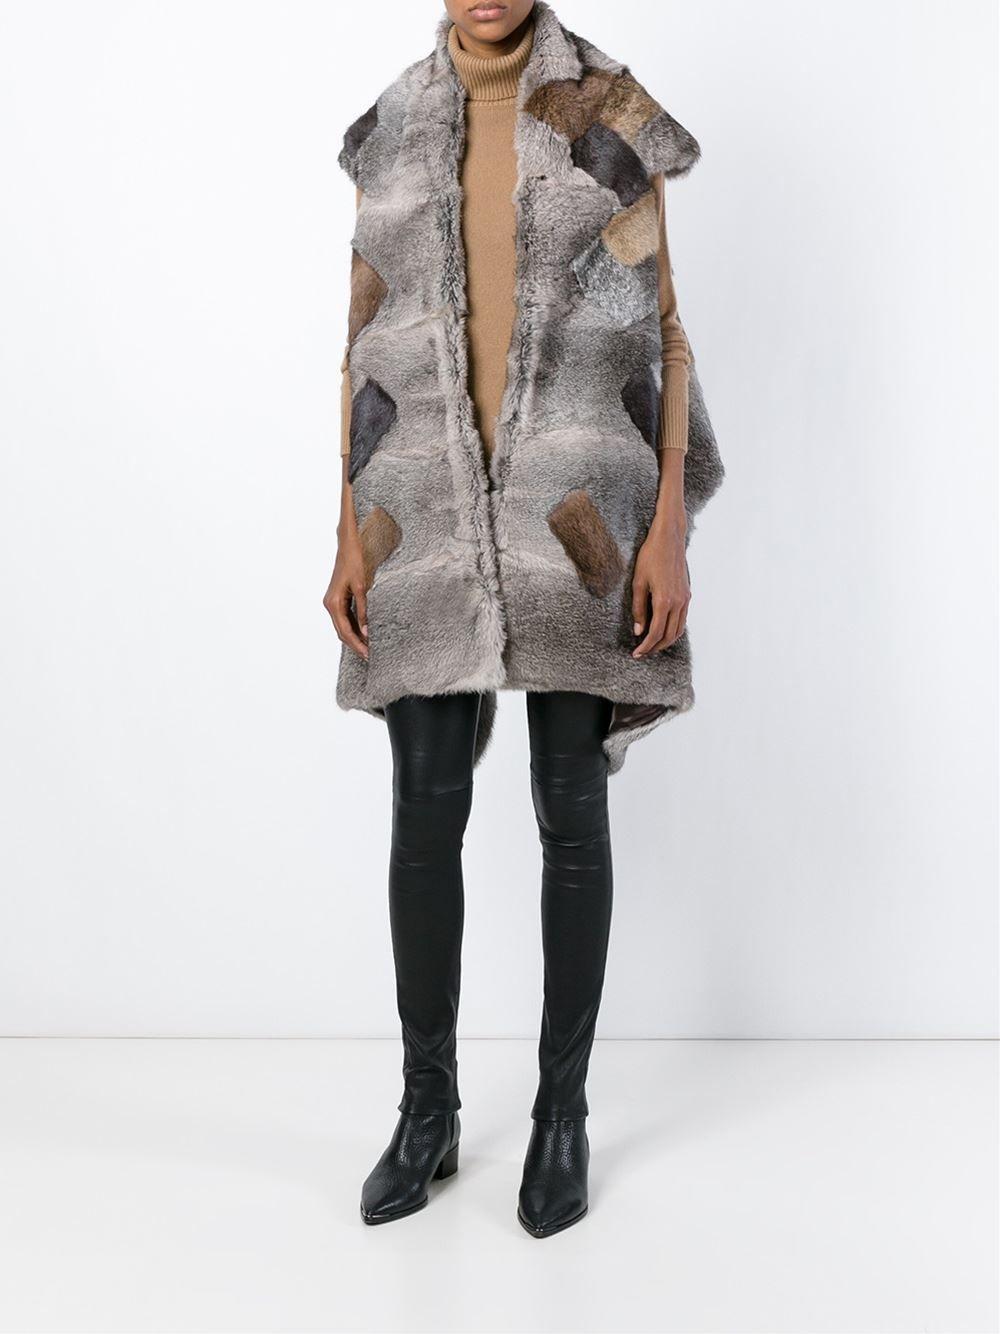 Maison Margiela Patchwork Fur Asymmetric Jacket - O' - Farfetch.com